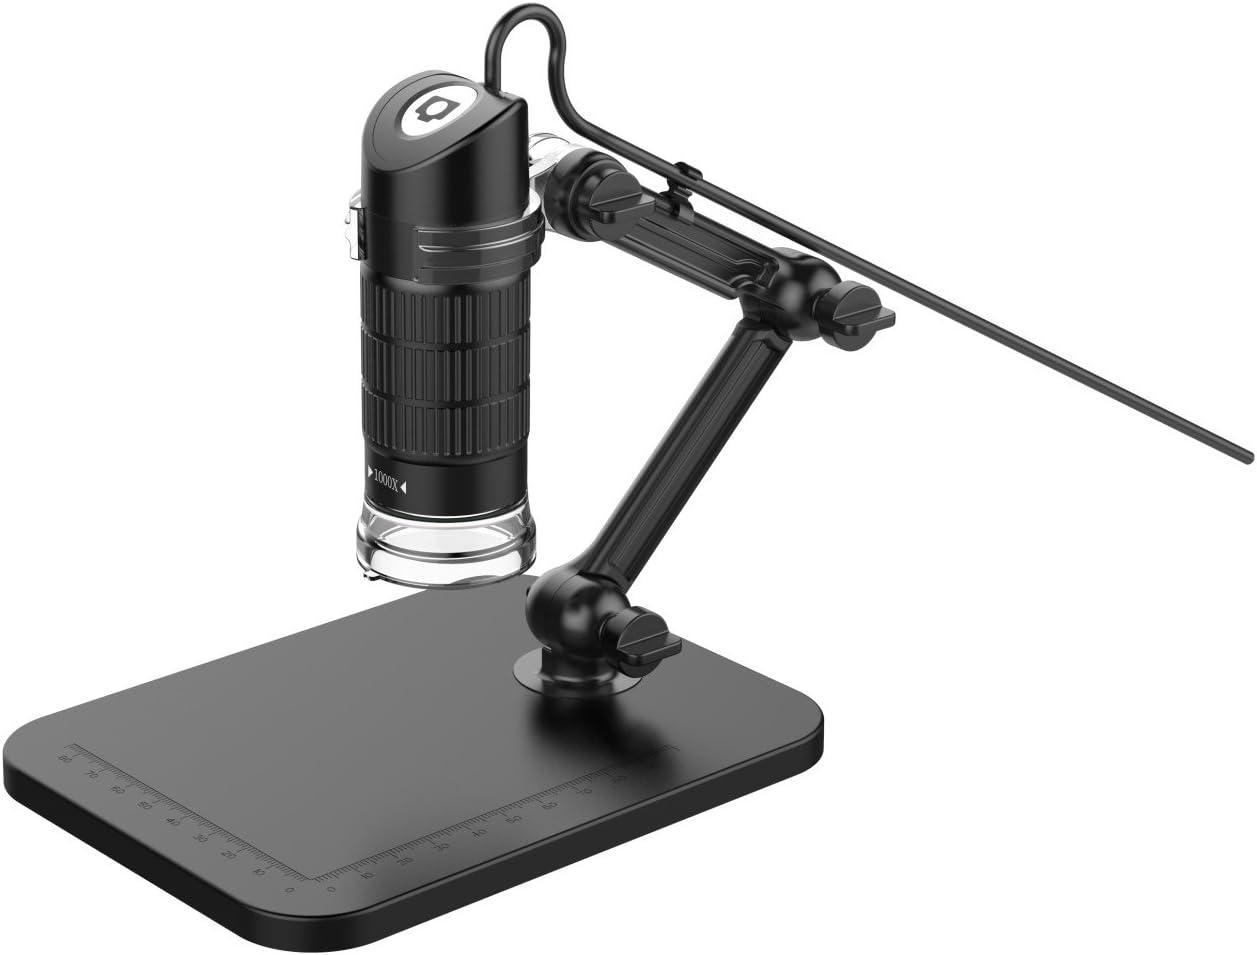 500X Kanavano USB Digital Microscope 20X-1000X 8 LED Handheld Microscope Endoscope Magnifier PC Camera Teaching Repair Textile Cosmetology Skin Magnifier Send Elevator